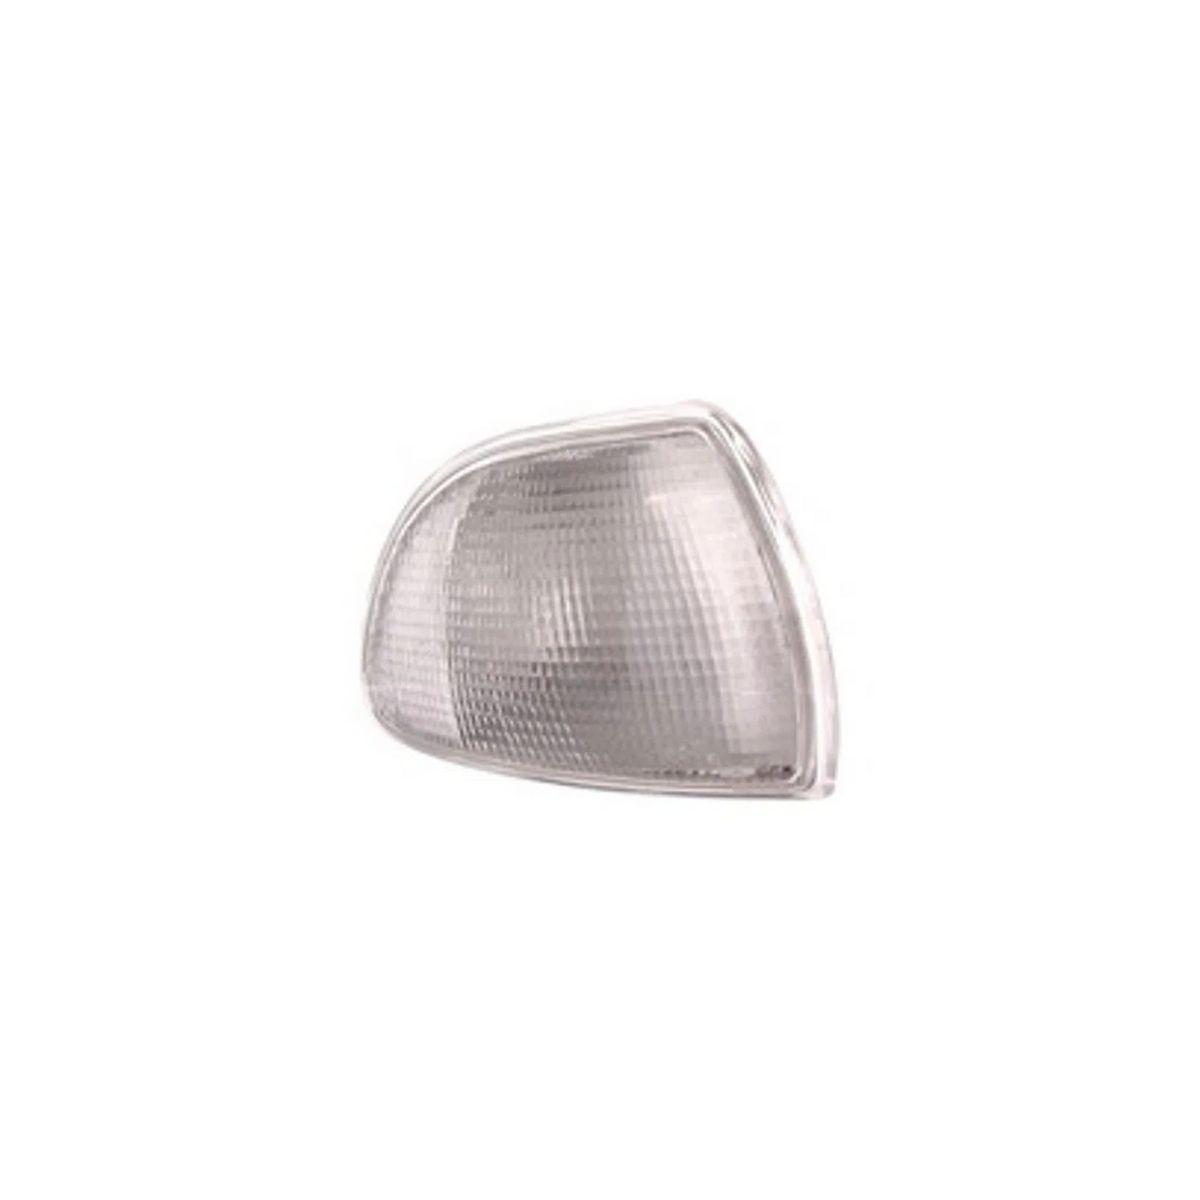 Lanterna Dianteira Direita Palio Siena 1996/2000 Cristal